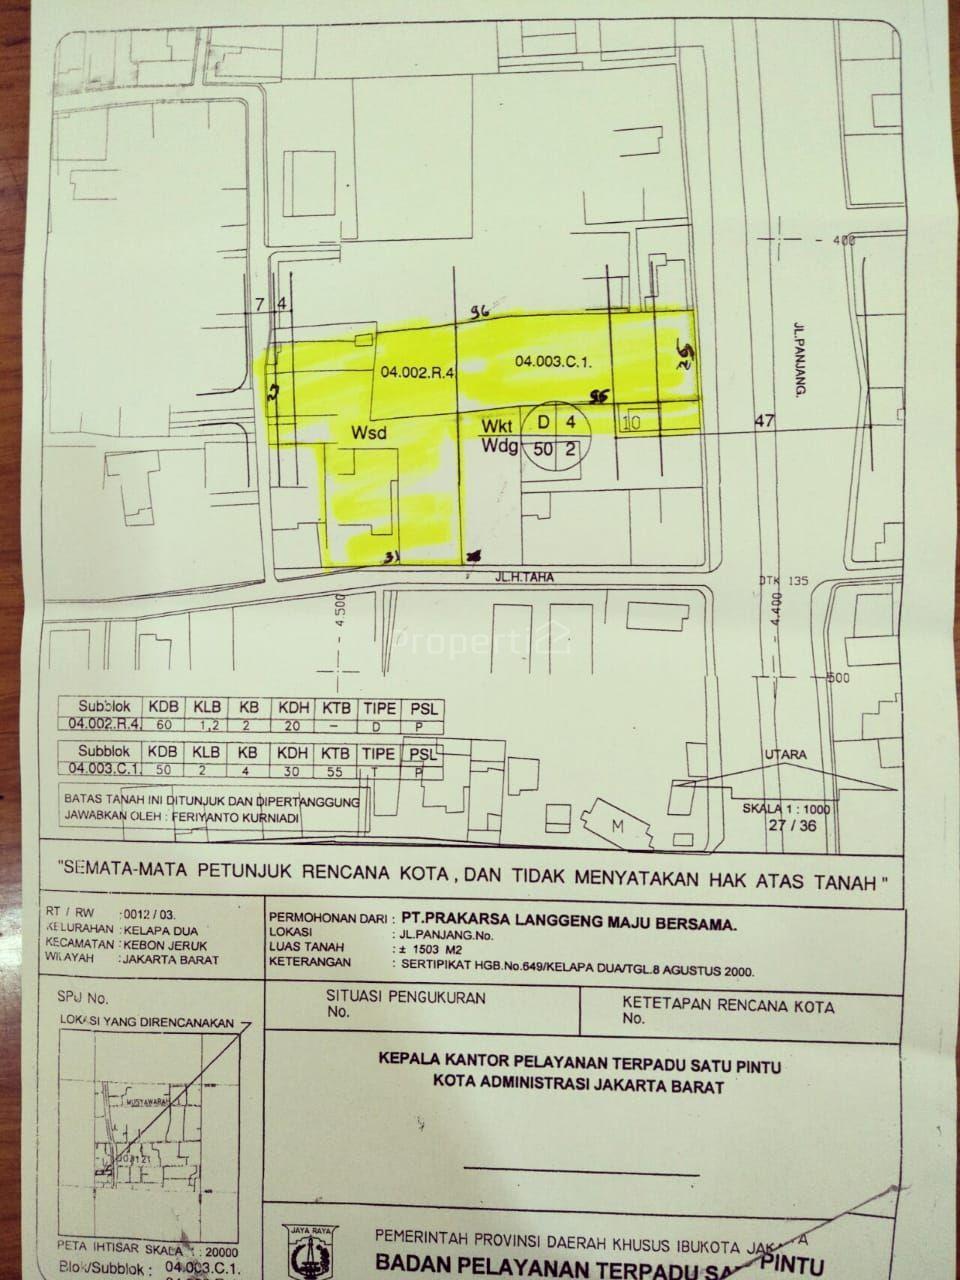 L-Shaped Commercial Land in Jalan Panjang Kebon Jeruk, Jakarta Barat